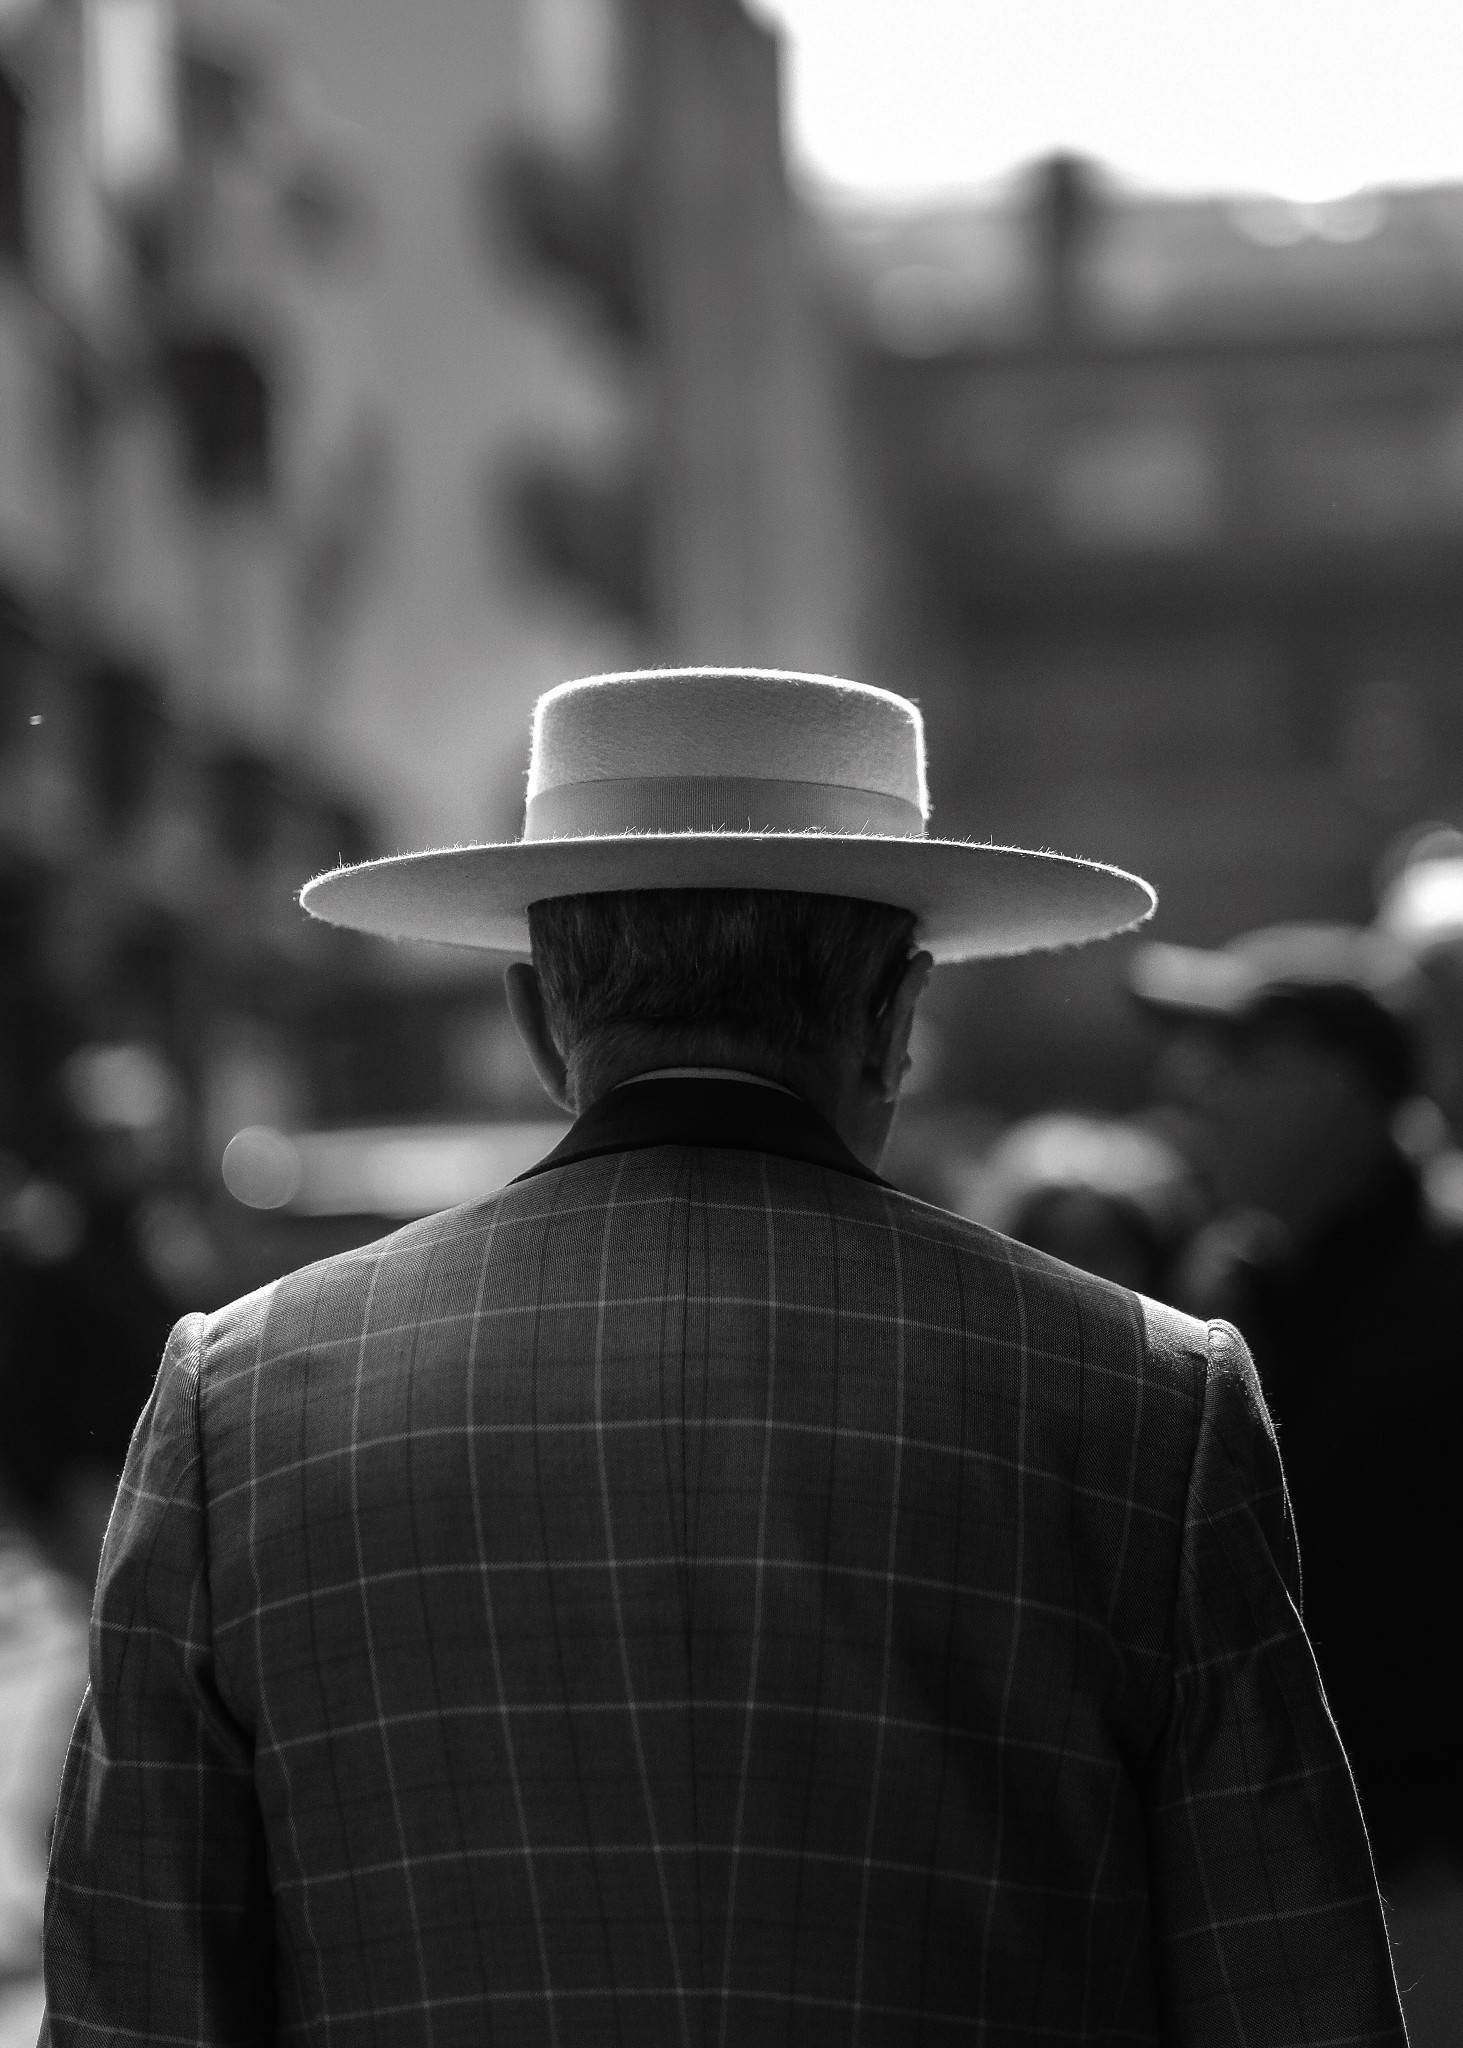 Bildverkstad Man with a hat